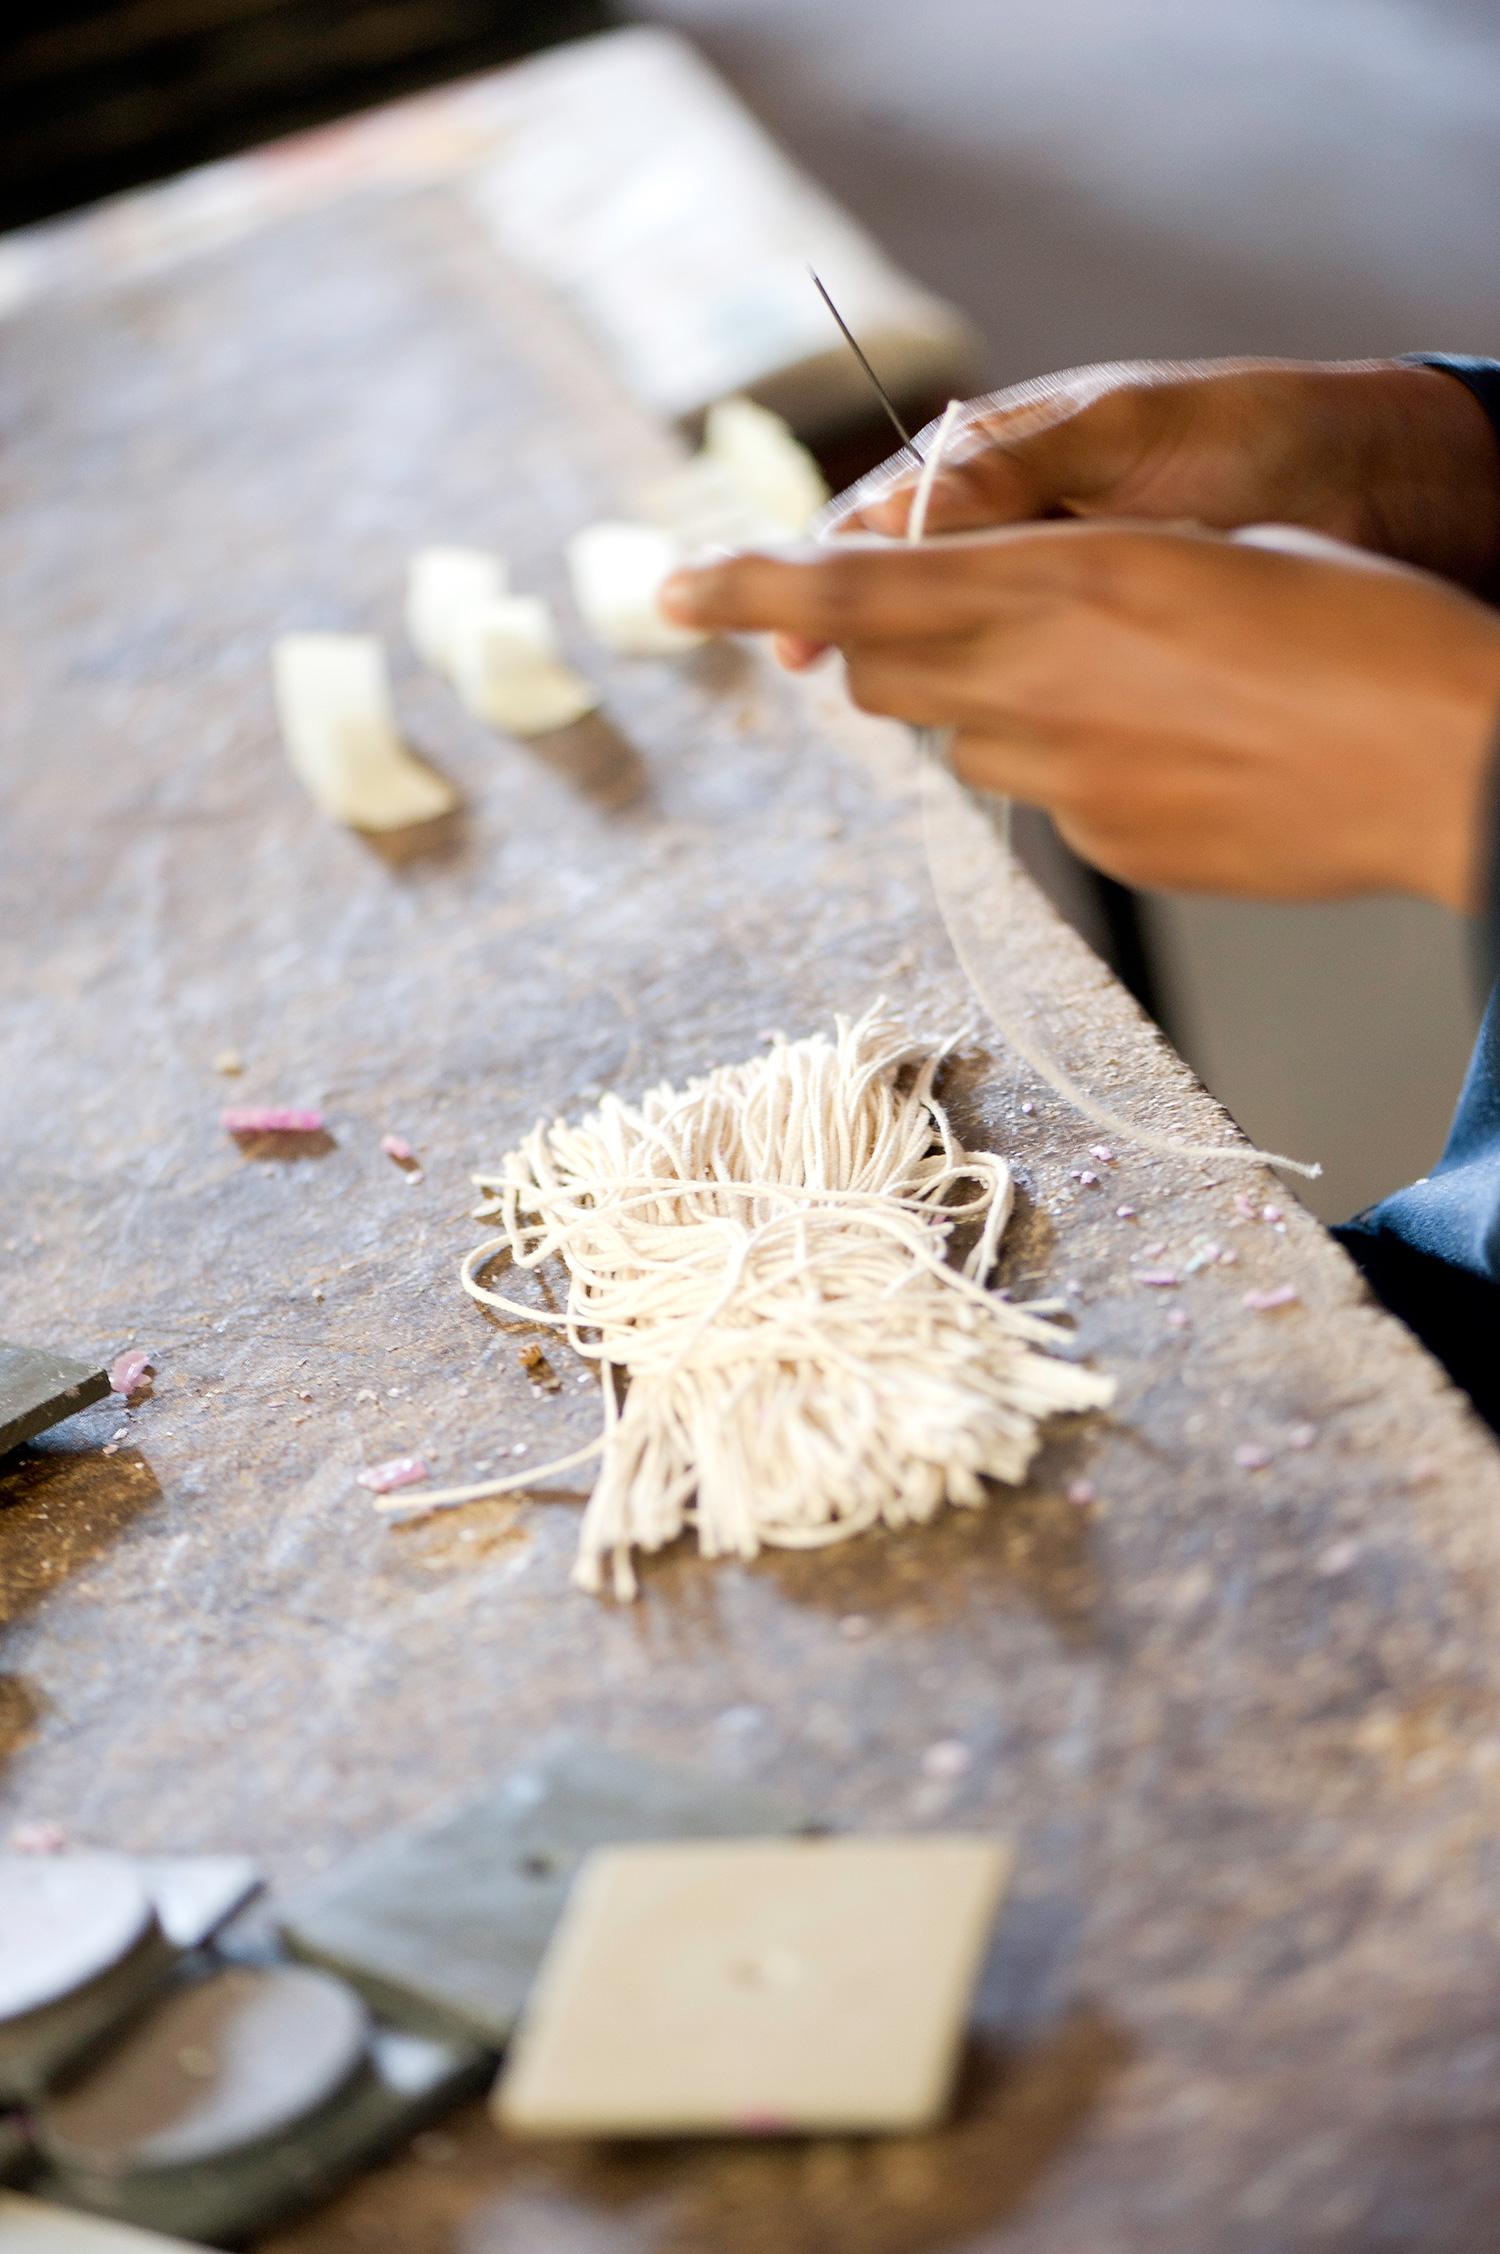 kapula-handmade-soy-candles-process-cutting-wicks.jpg